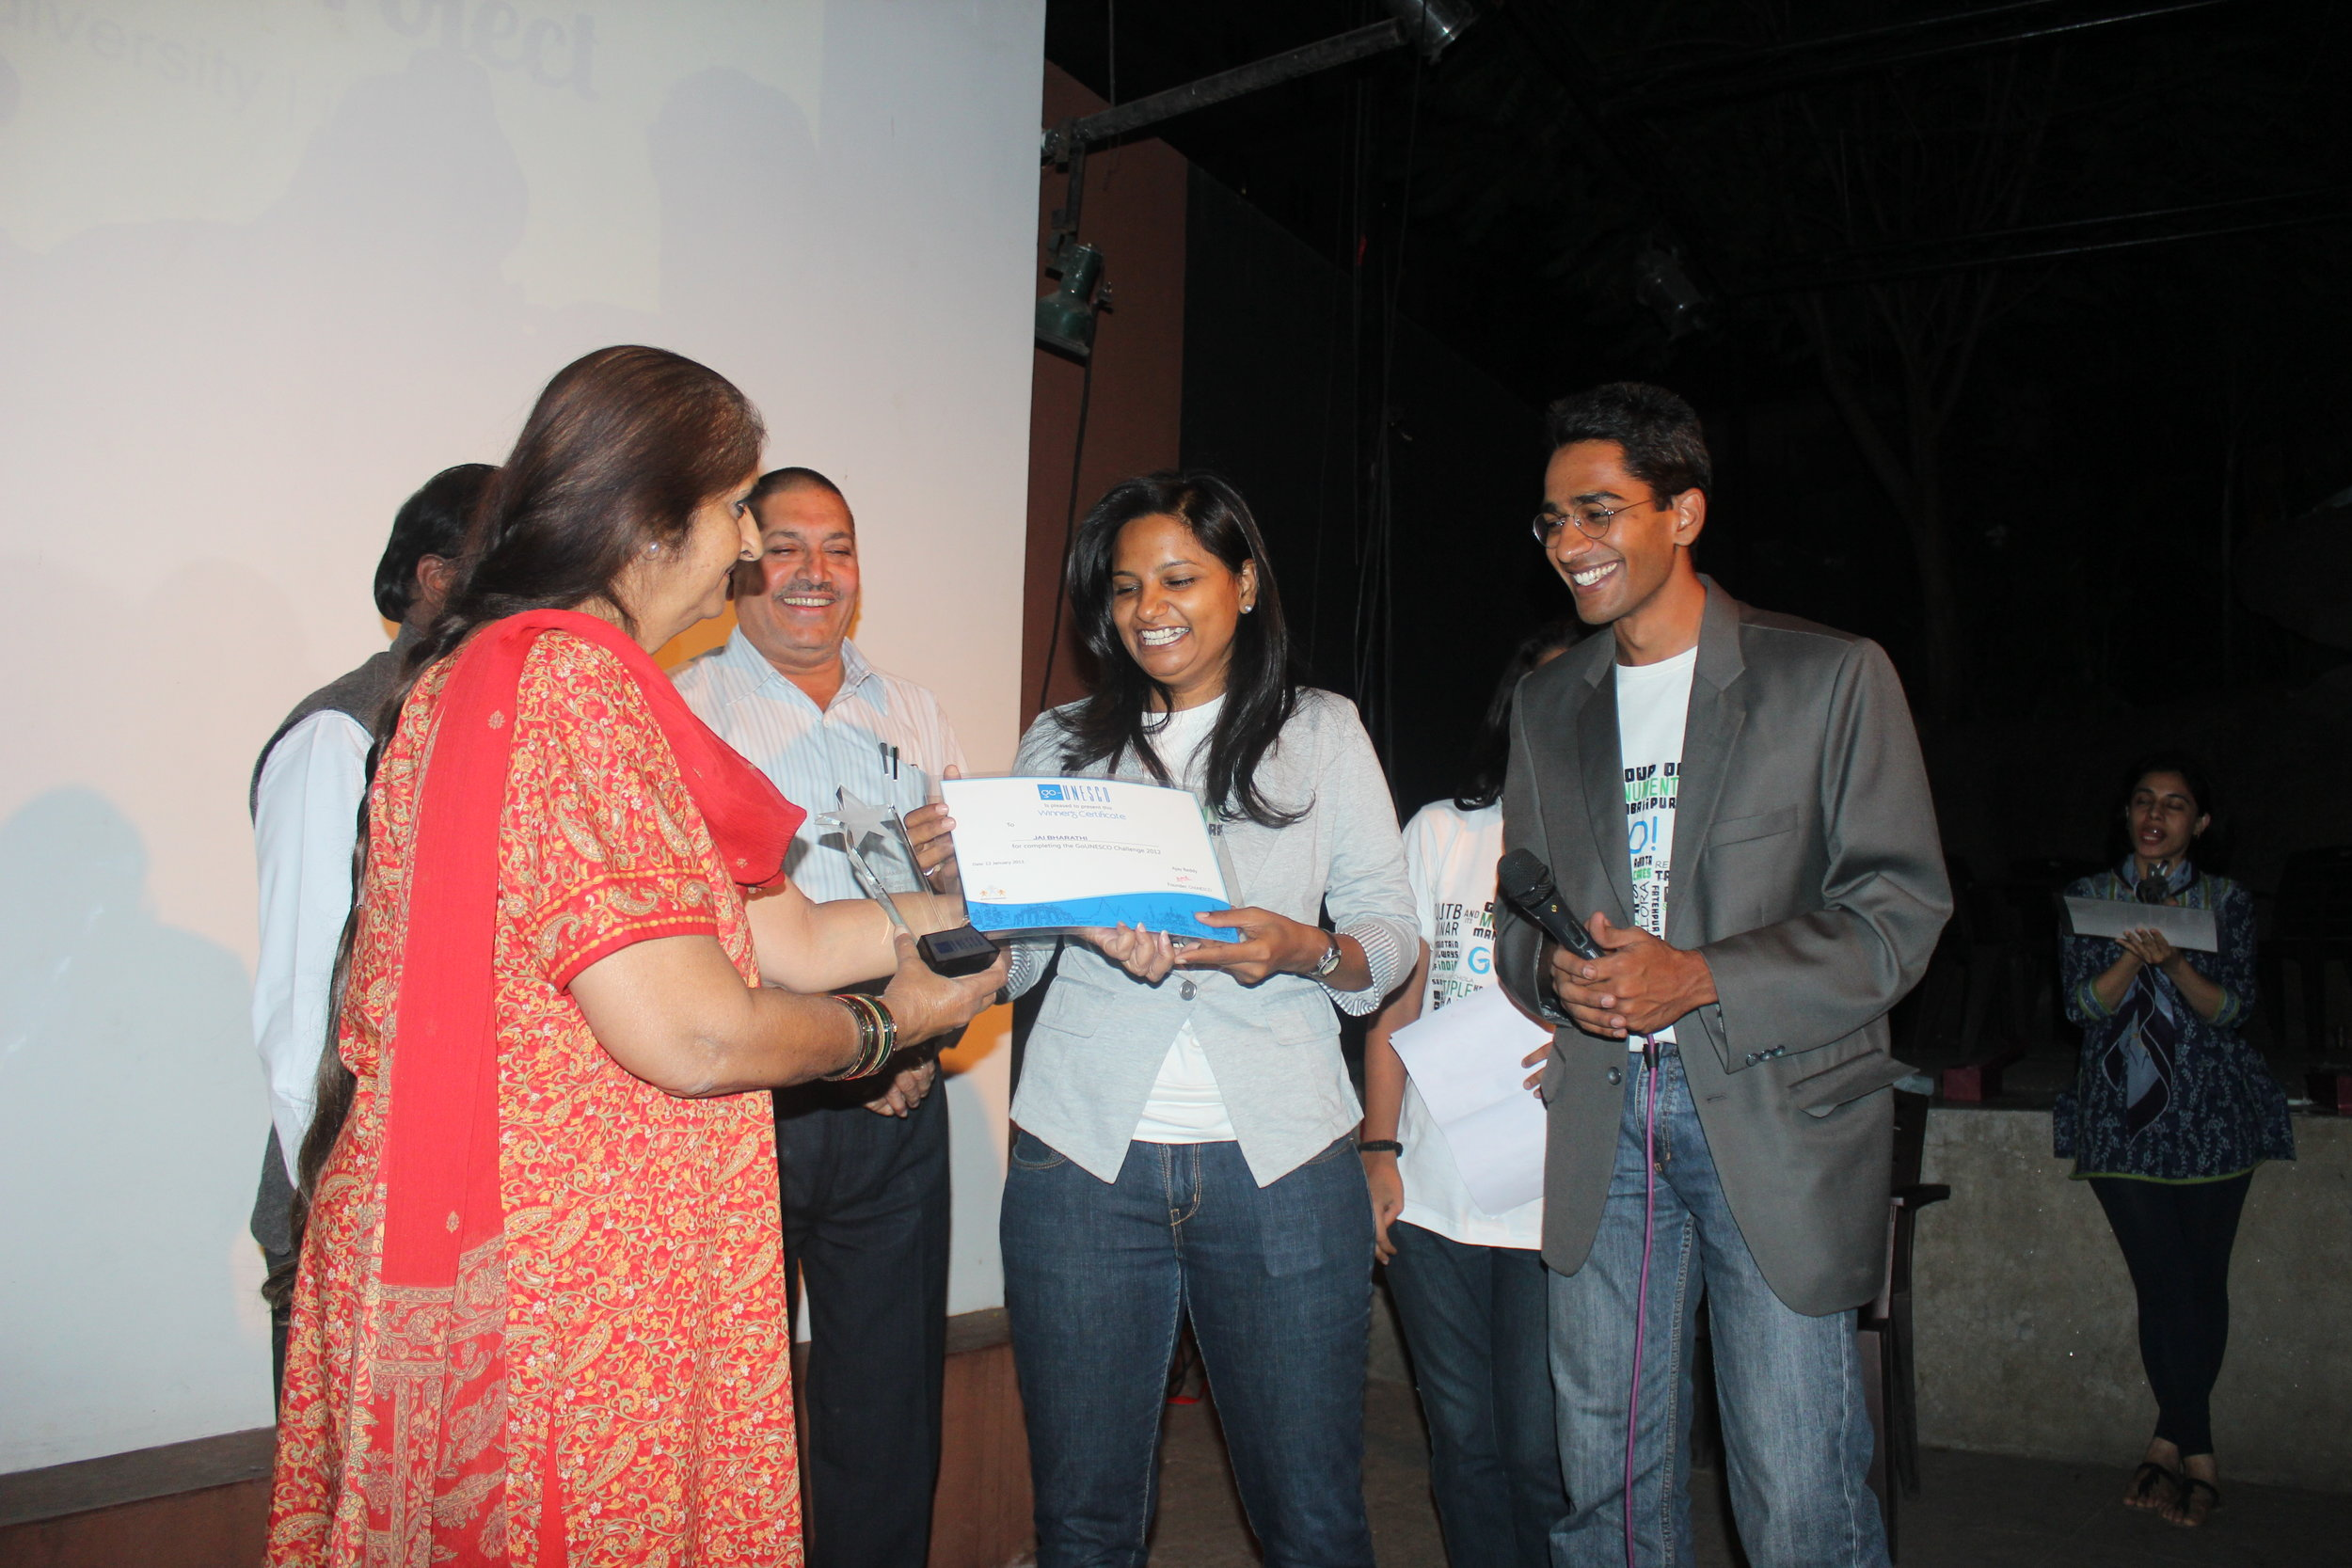 Jai bharathi - winner of GoUNESCO Travel Challenge 2012. Photo: GoUNESCO